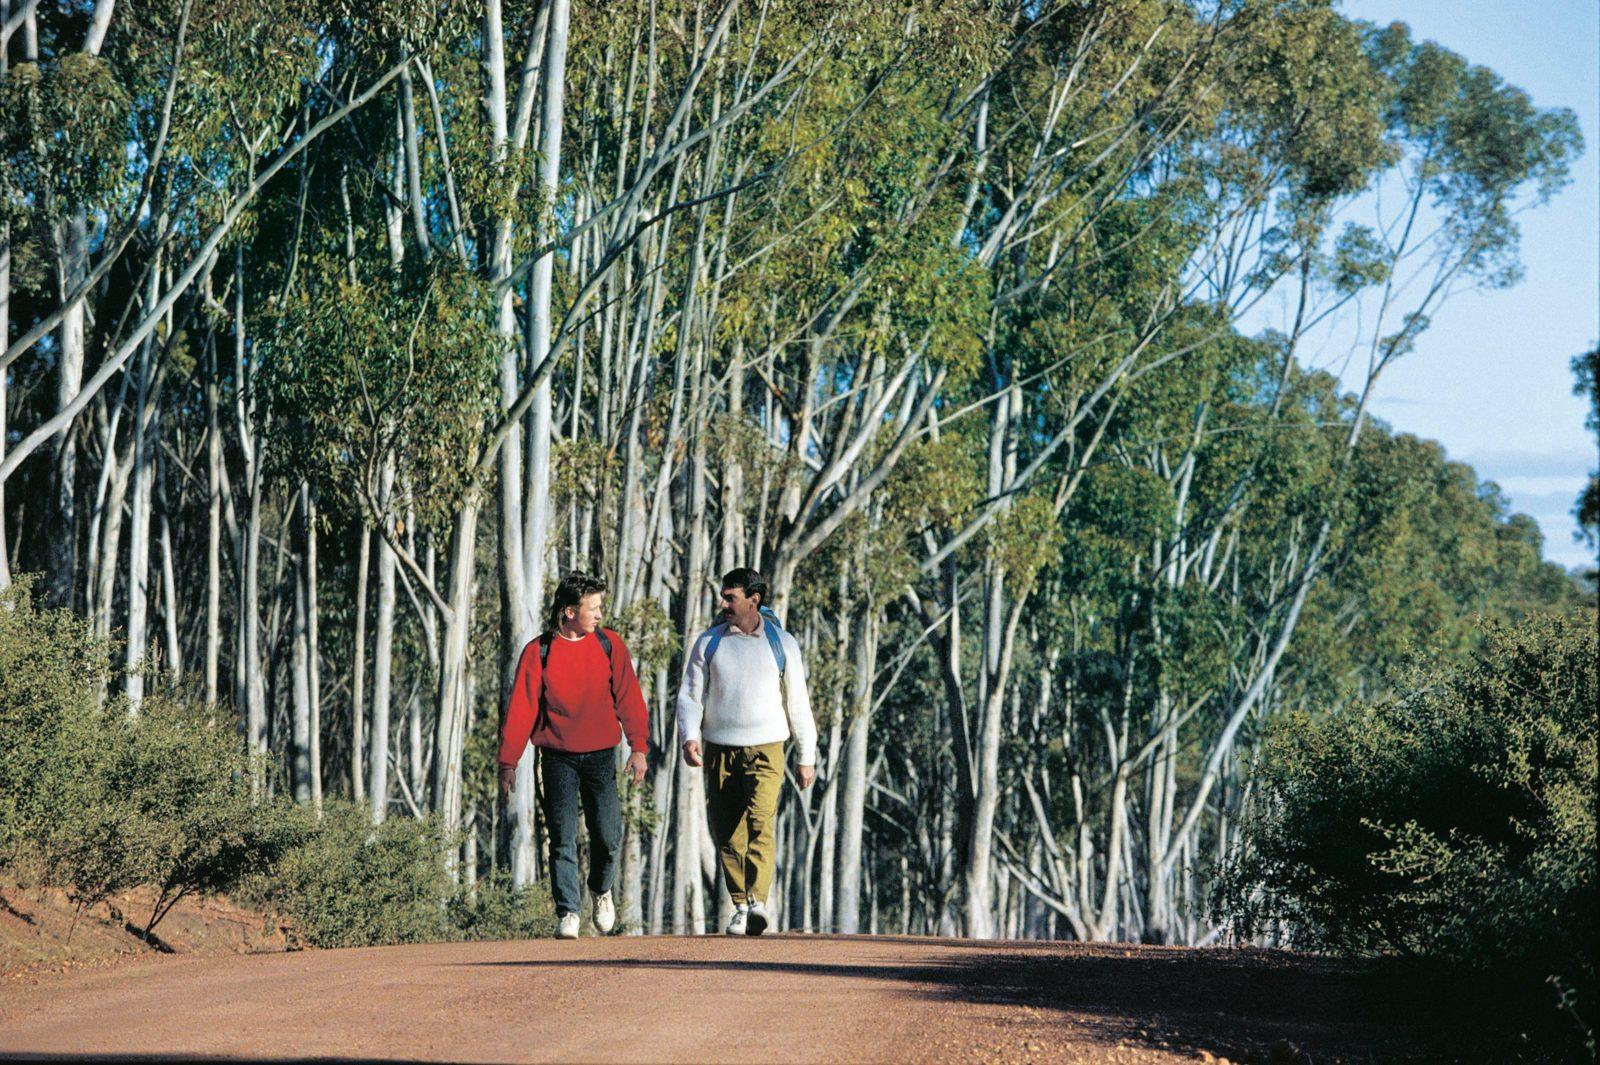 Congelin Camp, Dryandra Woodland, Western Australia